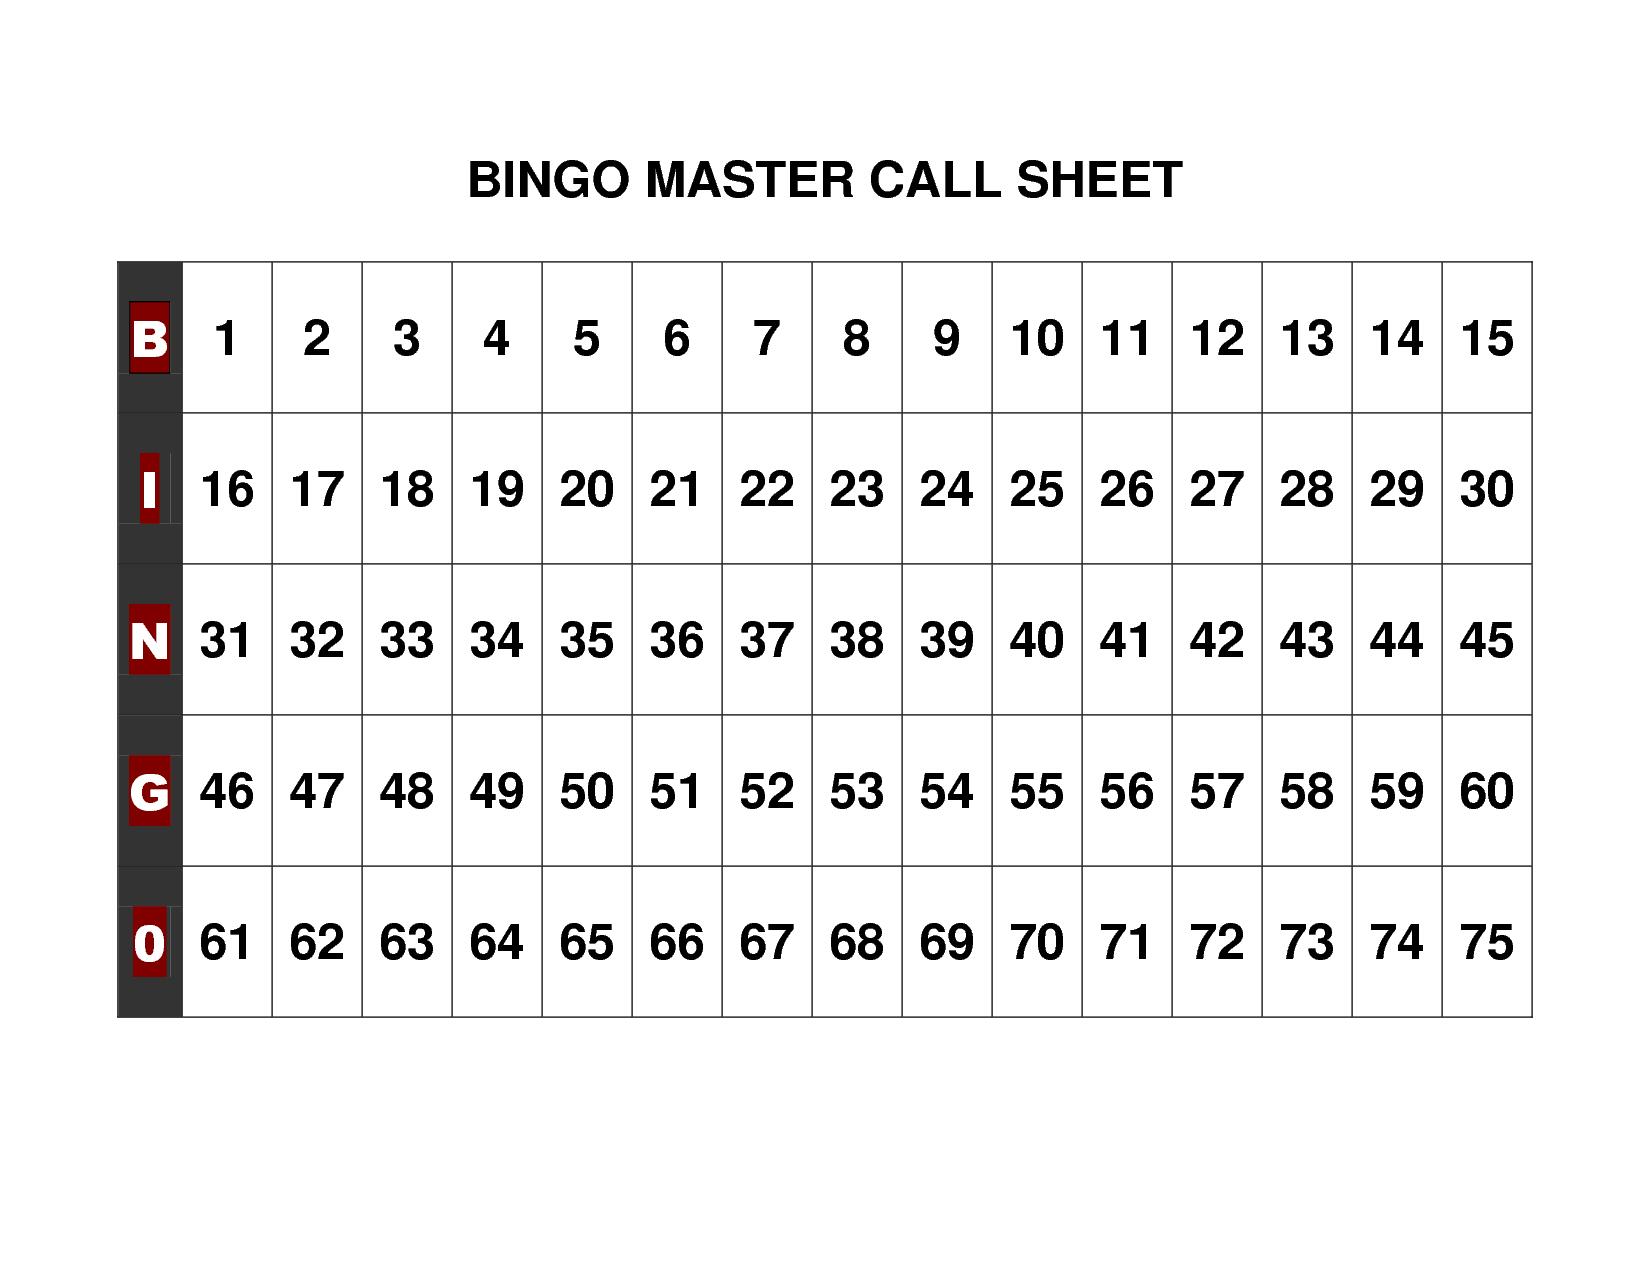 Free+Printable+Bingo+Call+Sheet | Bingo | Bingo Calls, Free - Free Printable Bingo Cards Random Numbers